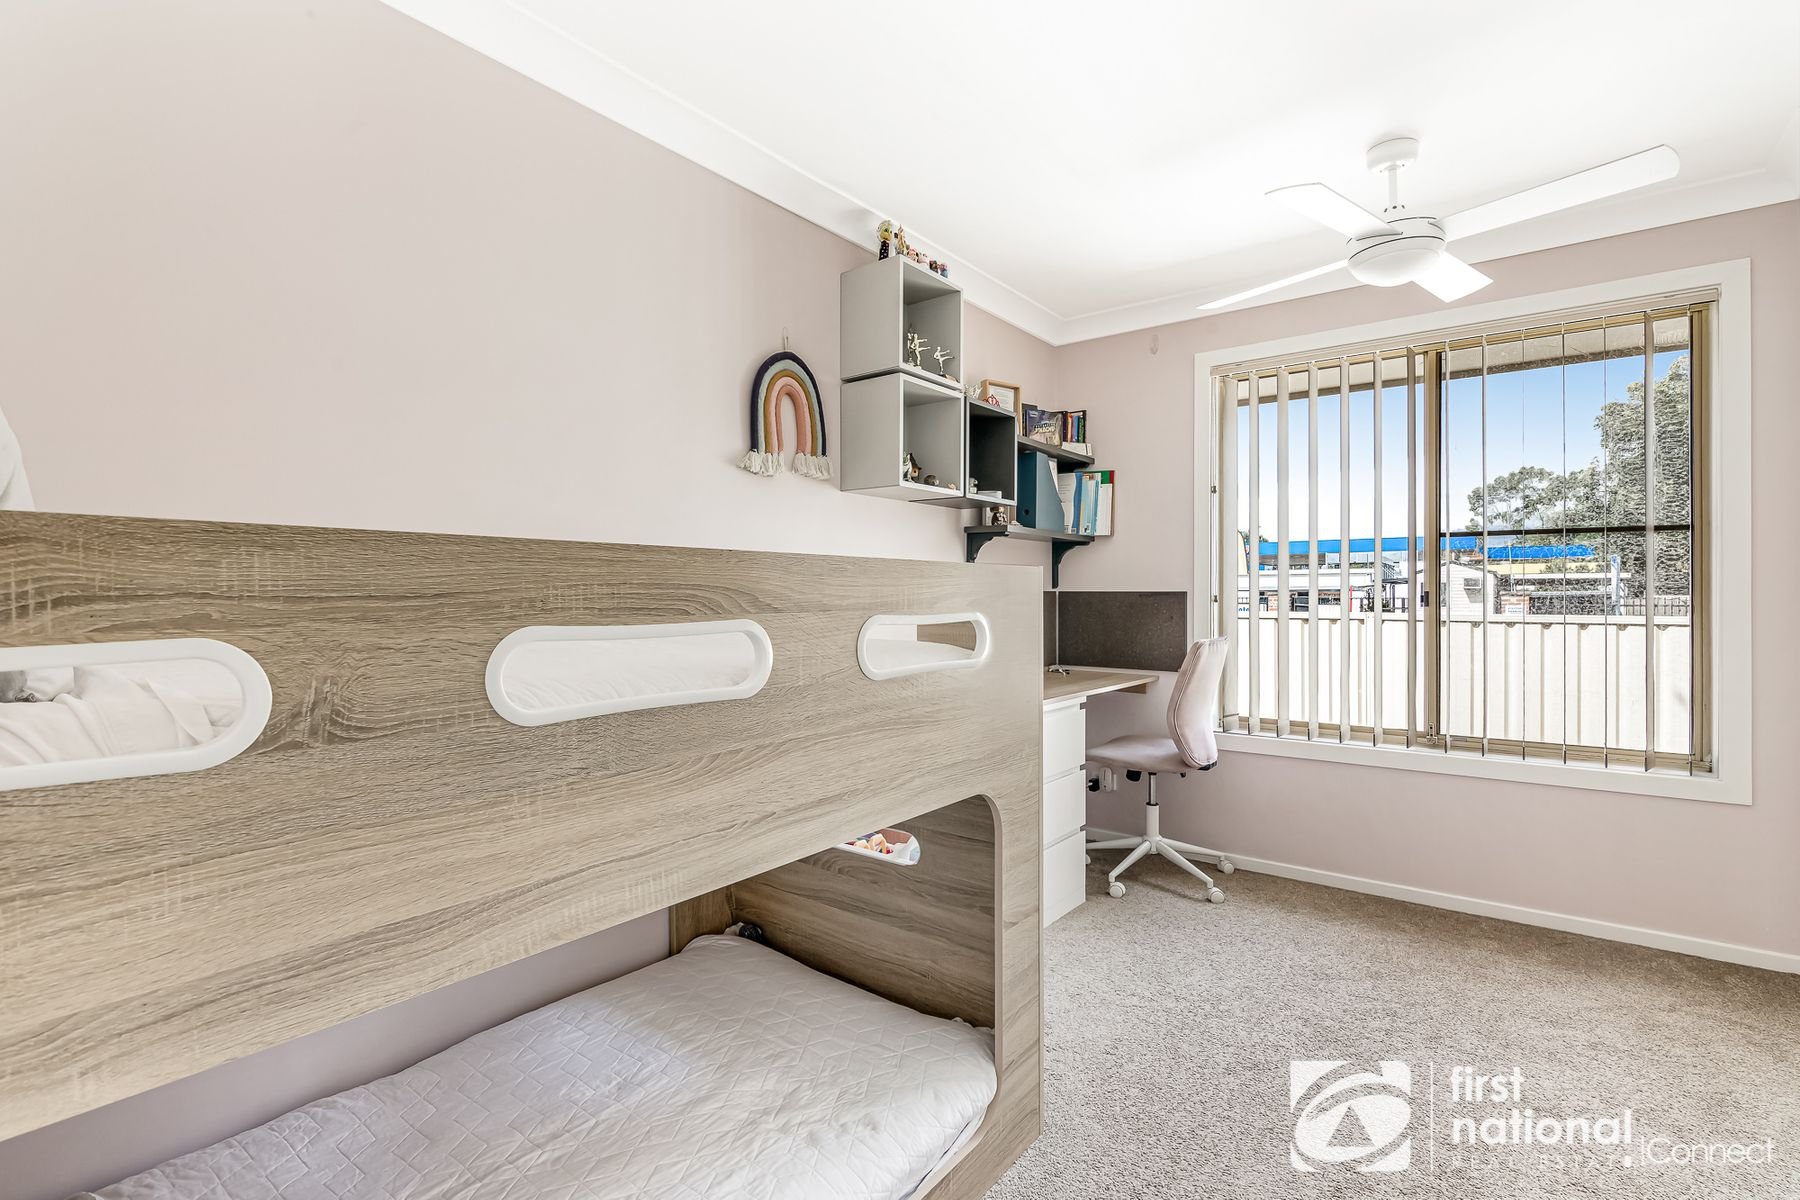 2/25 Charles St, North Richmond, NSW 2754